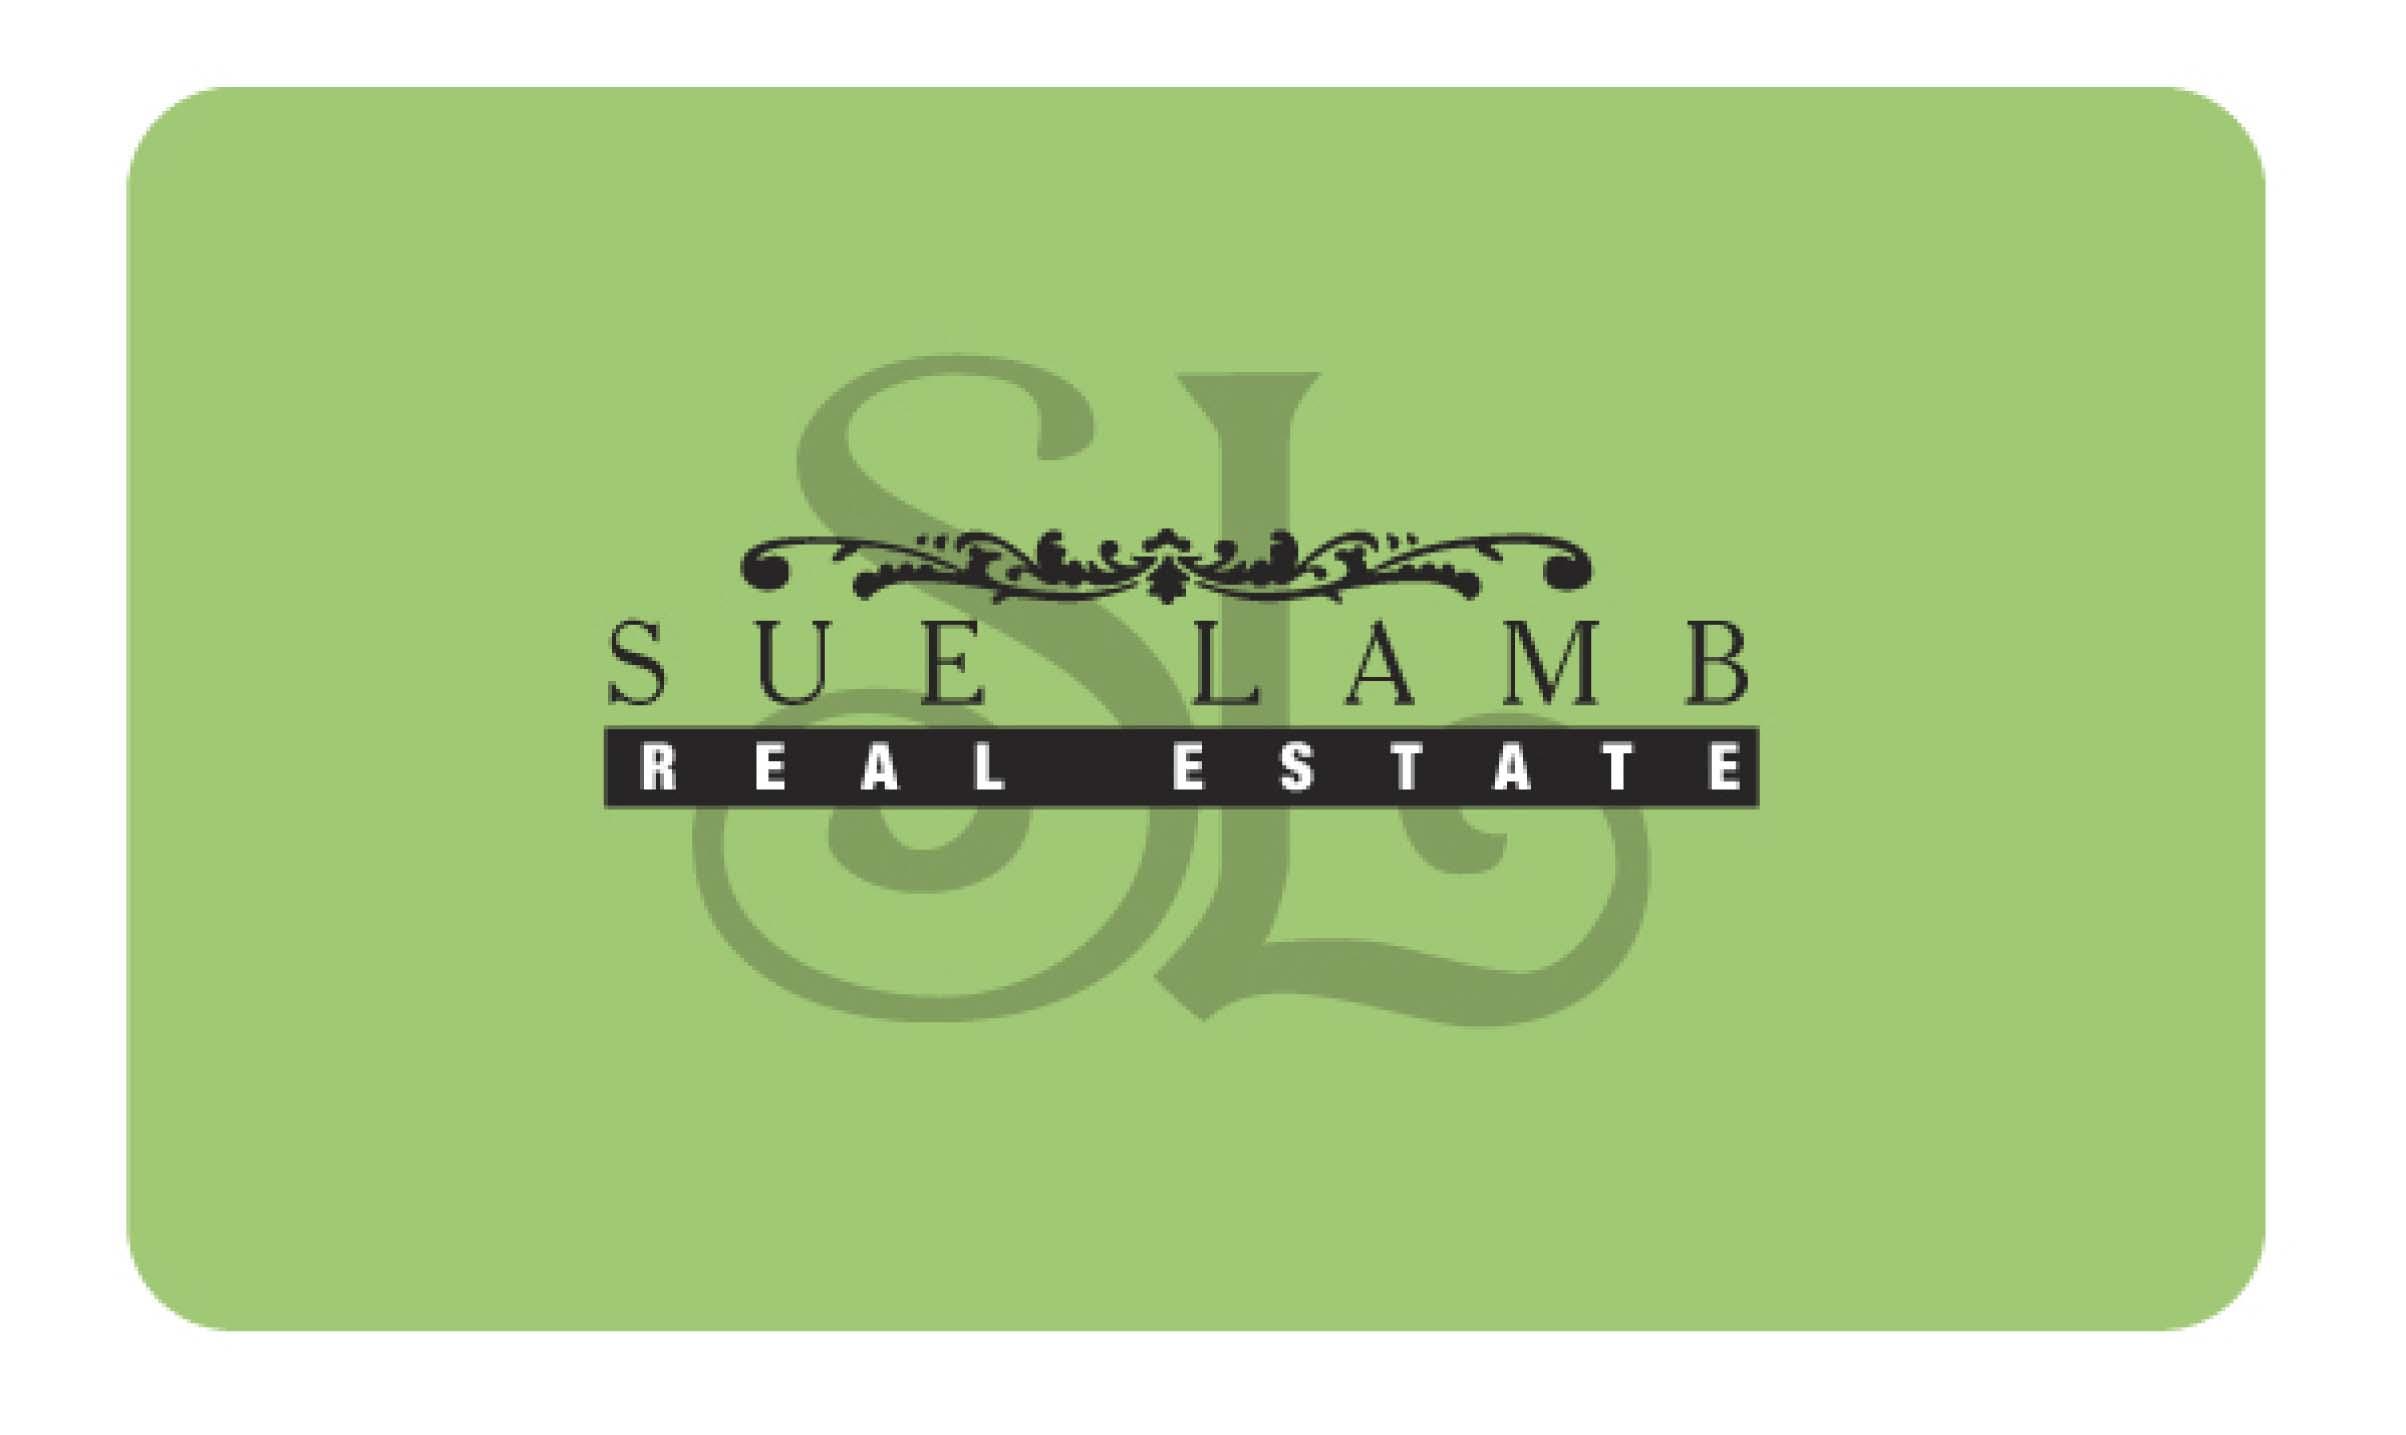 Sue Lamb Real Estate